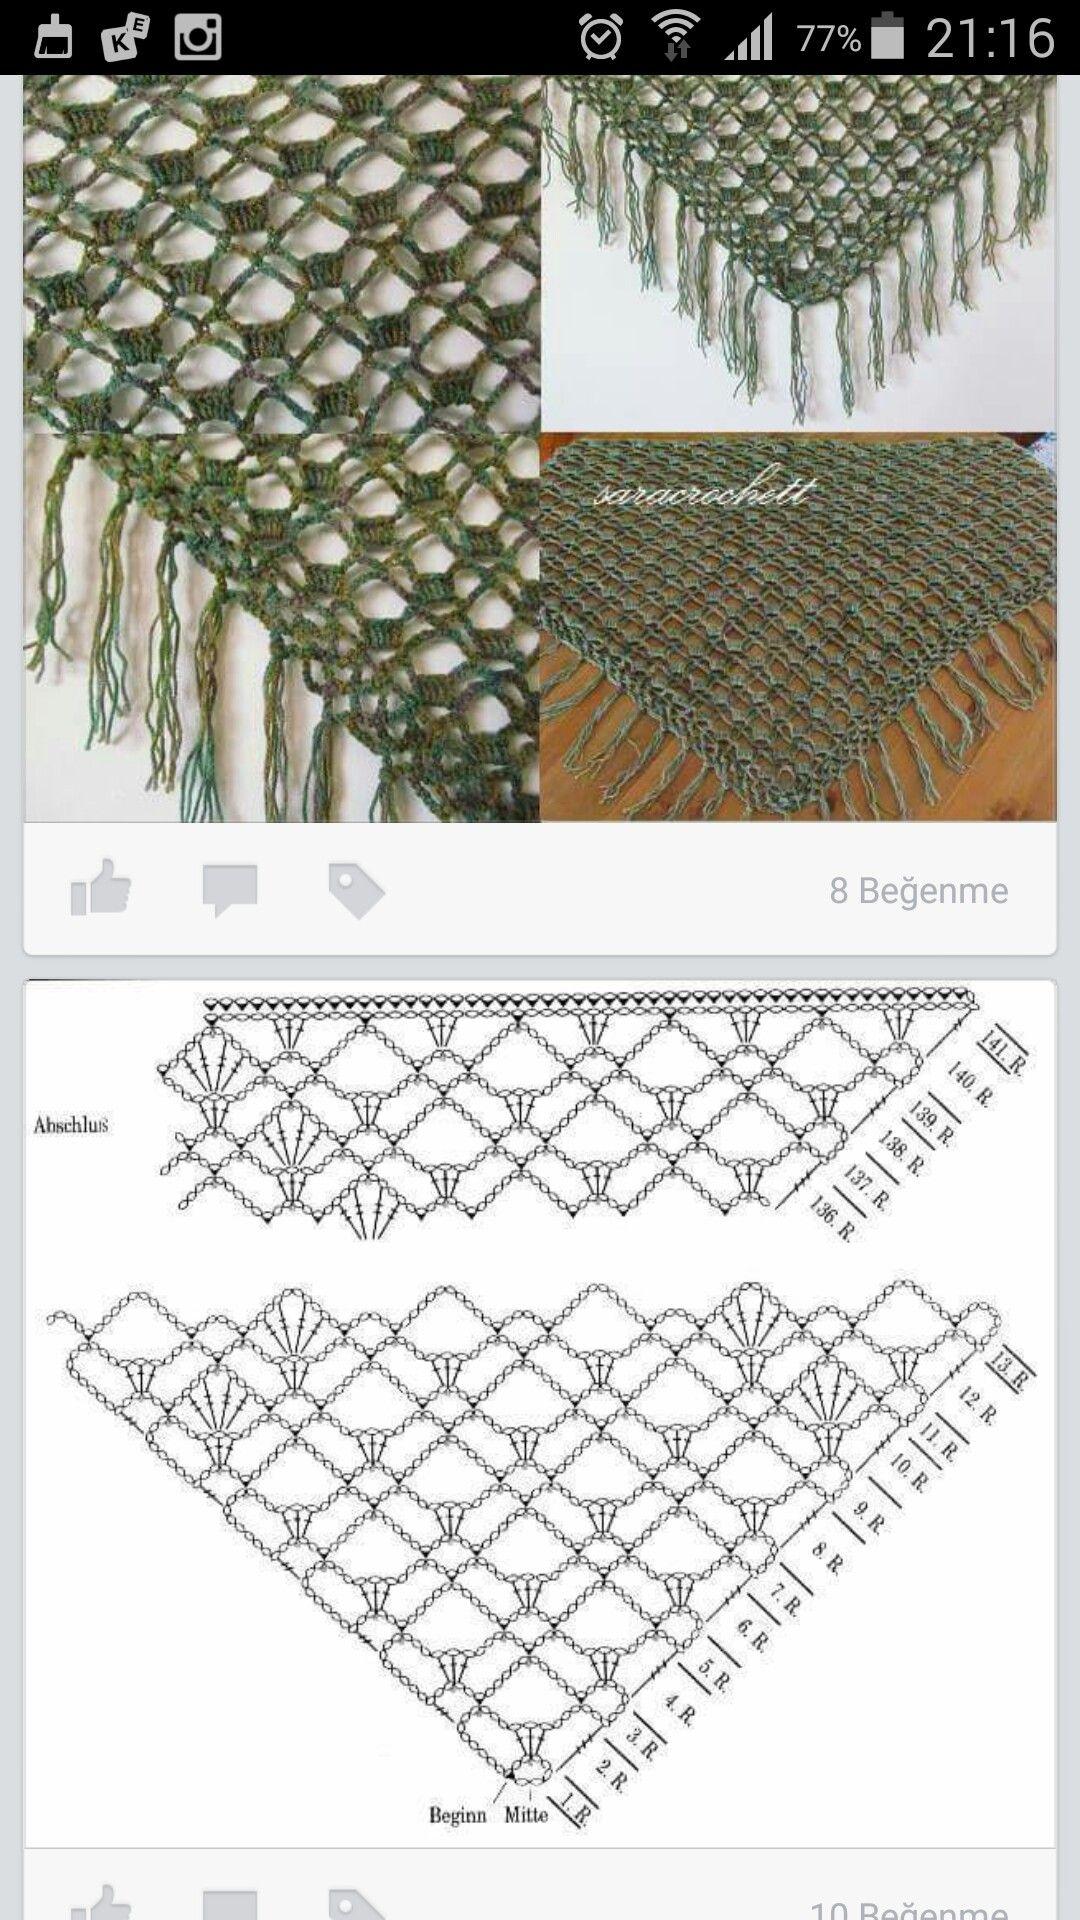 Pin de Claudia Giombi en Crochet | Pinterest | Chal, Ganchillo y Ponchos